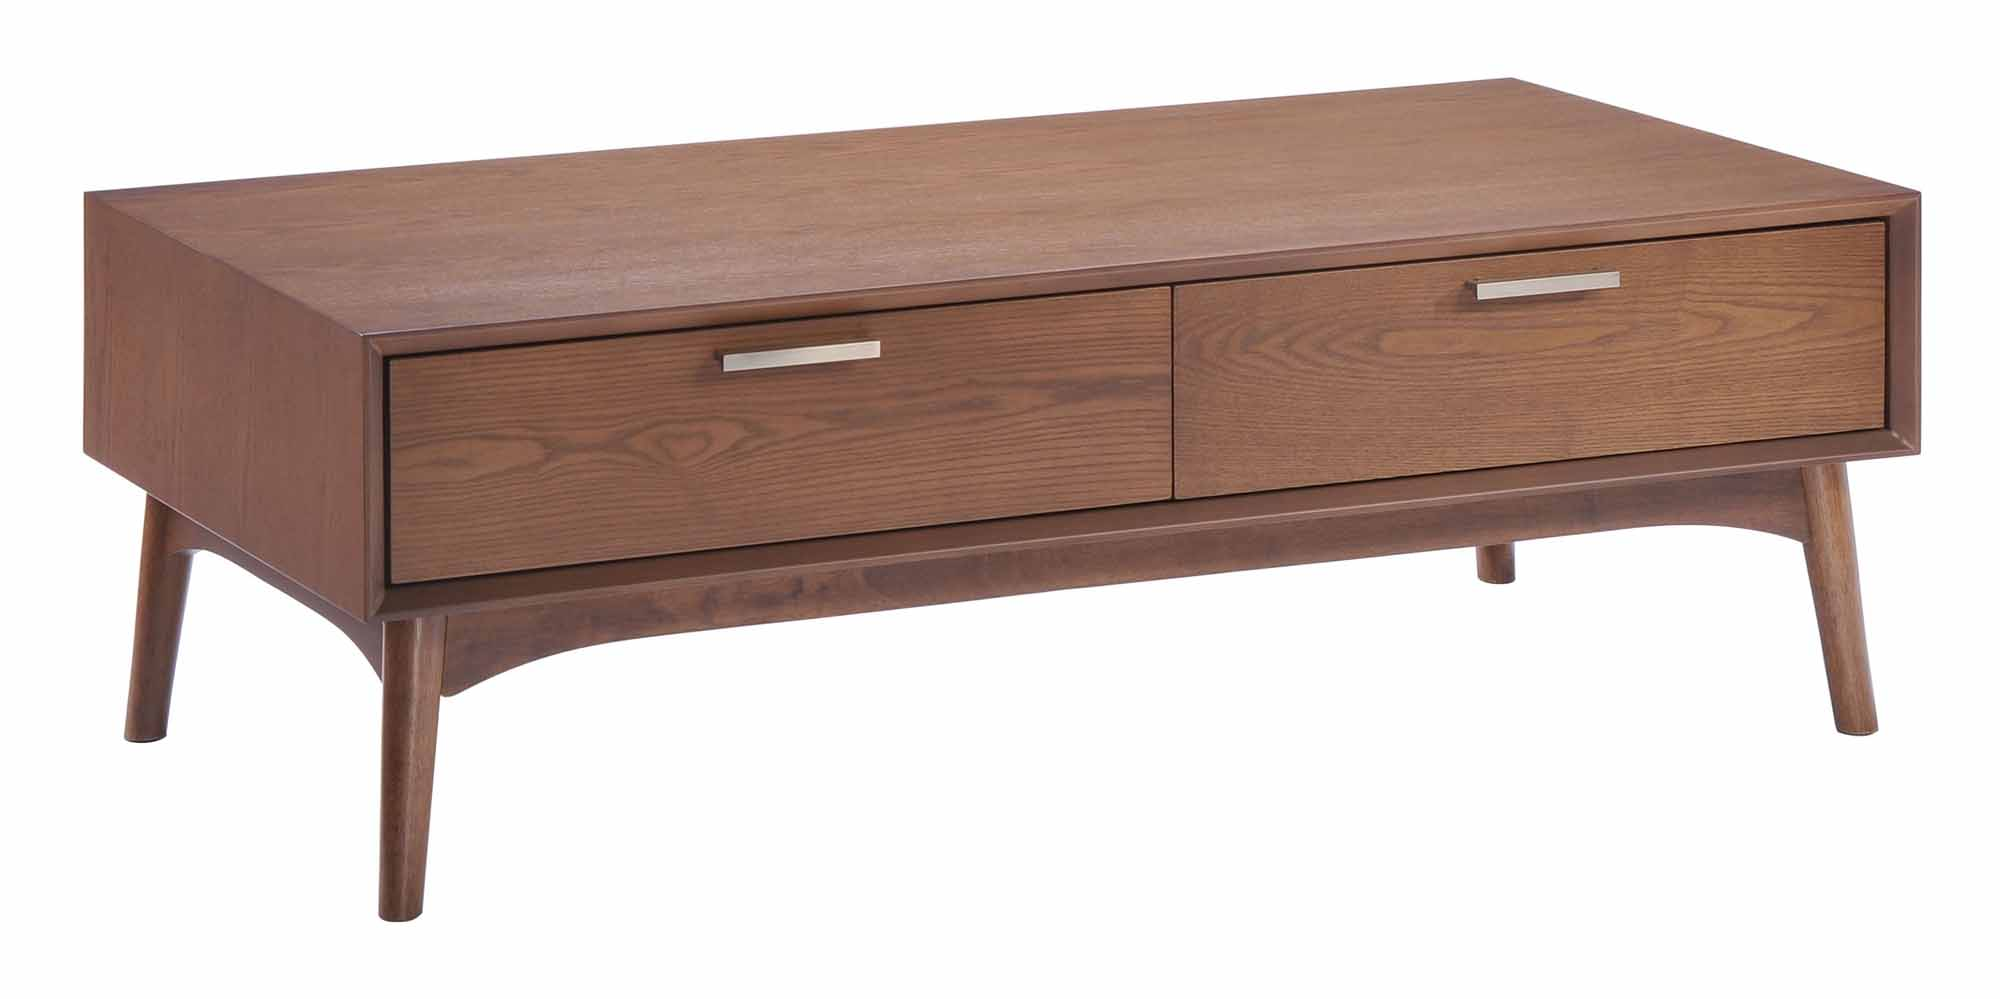 Design District Coffee Table Walnut By Zuo Modern